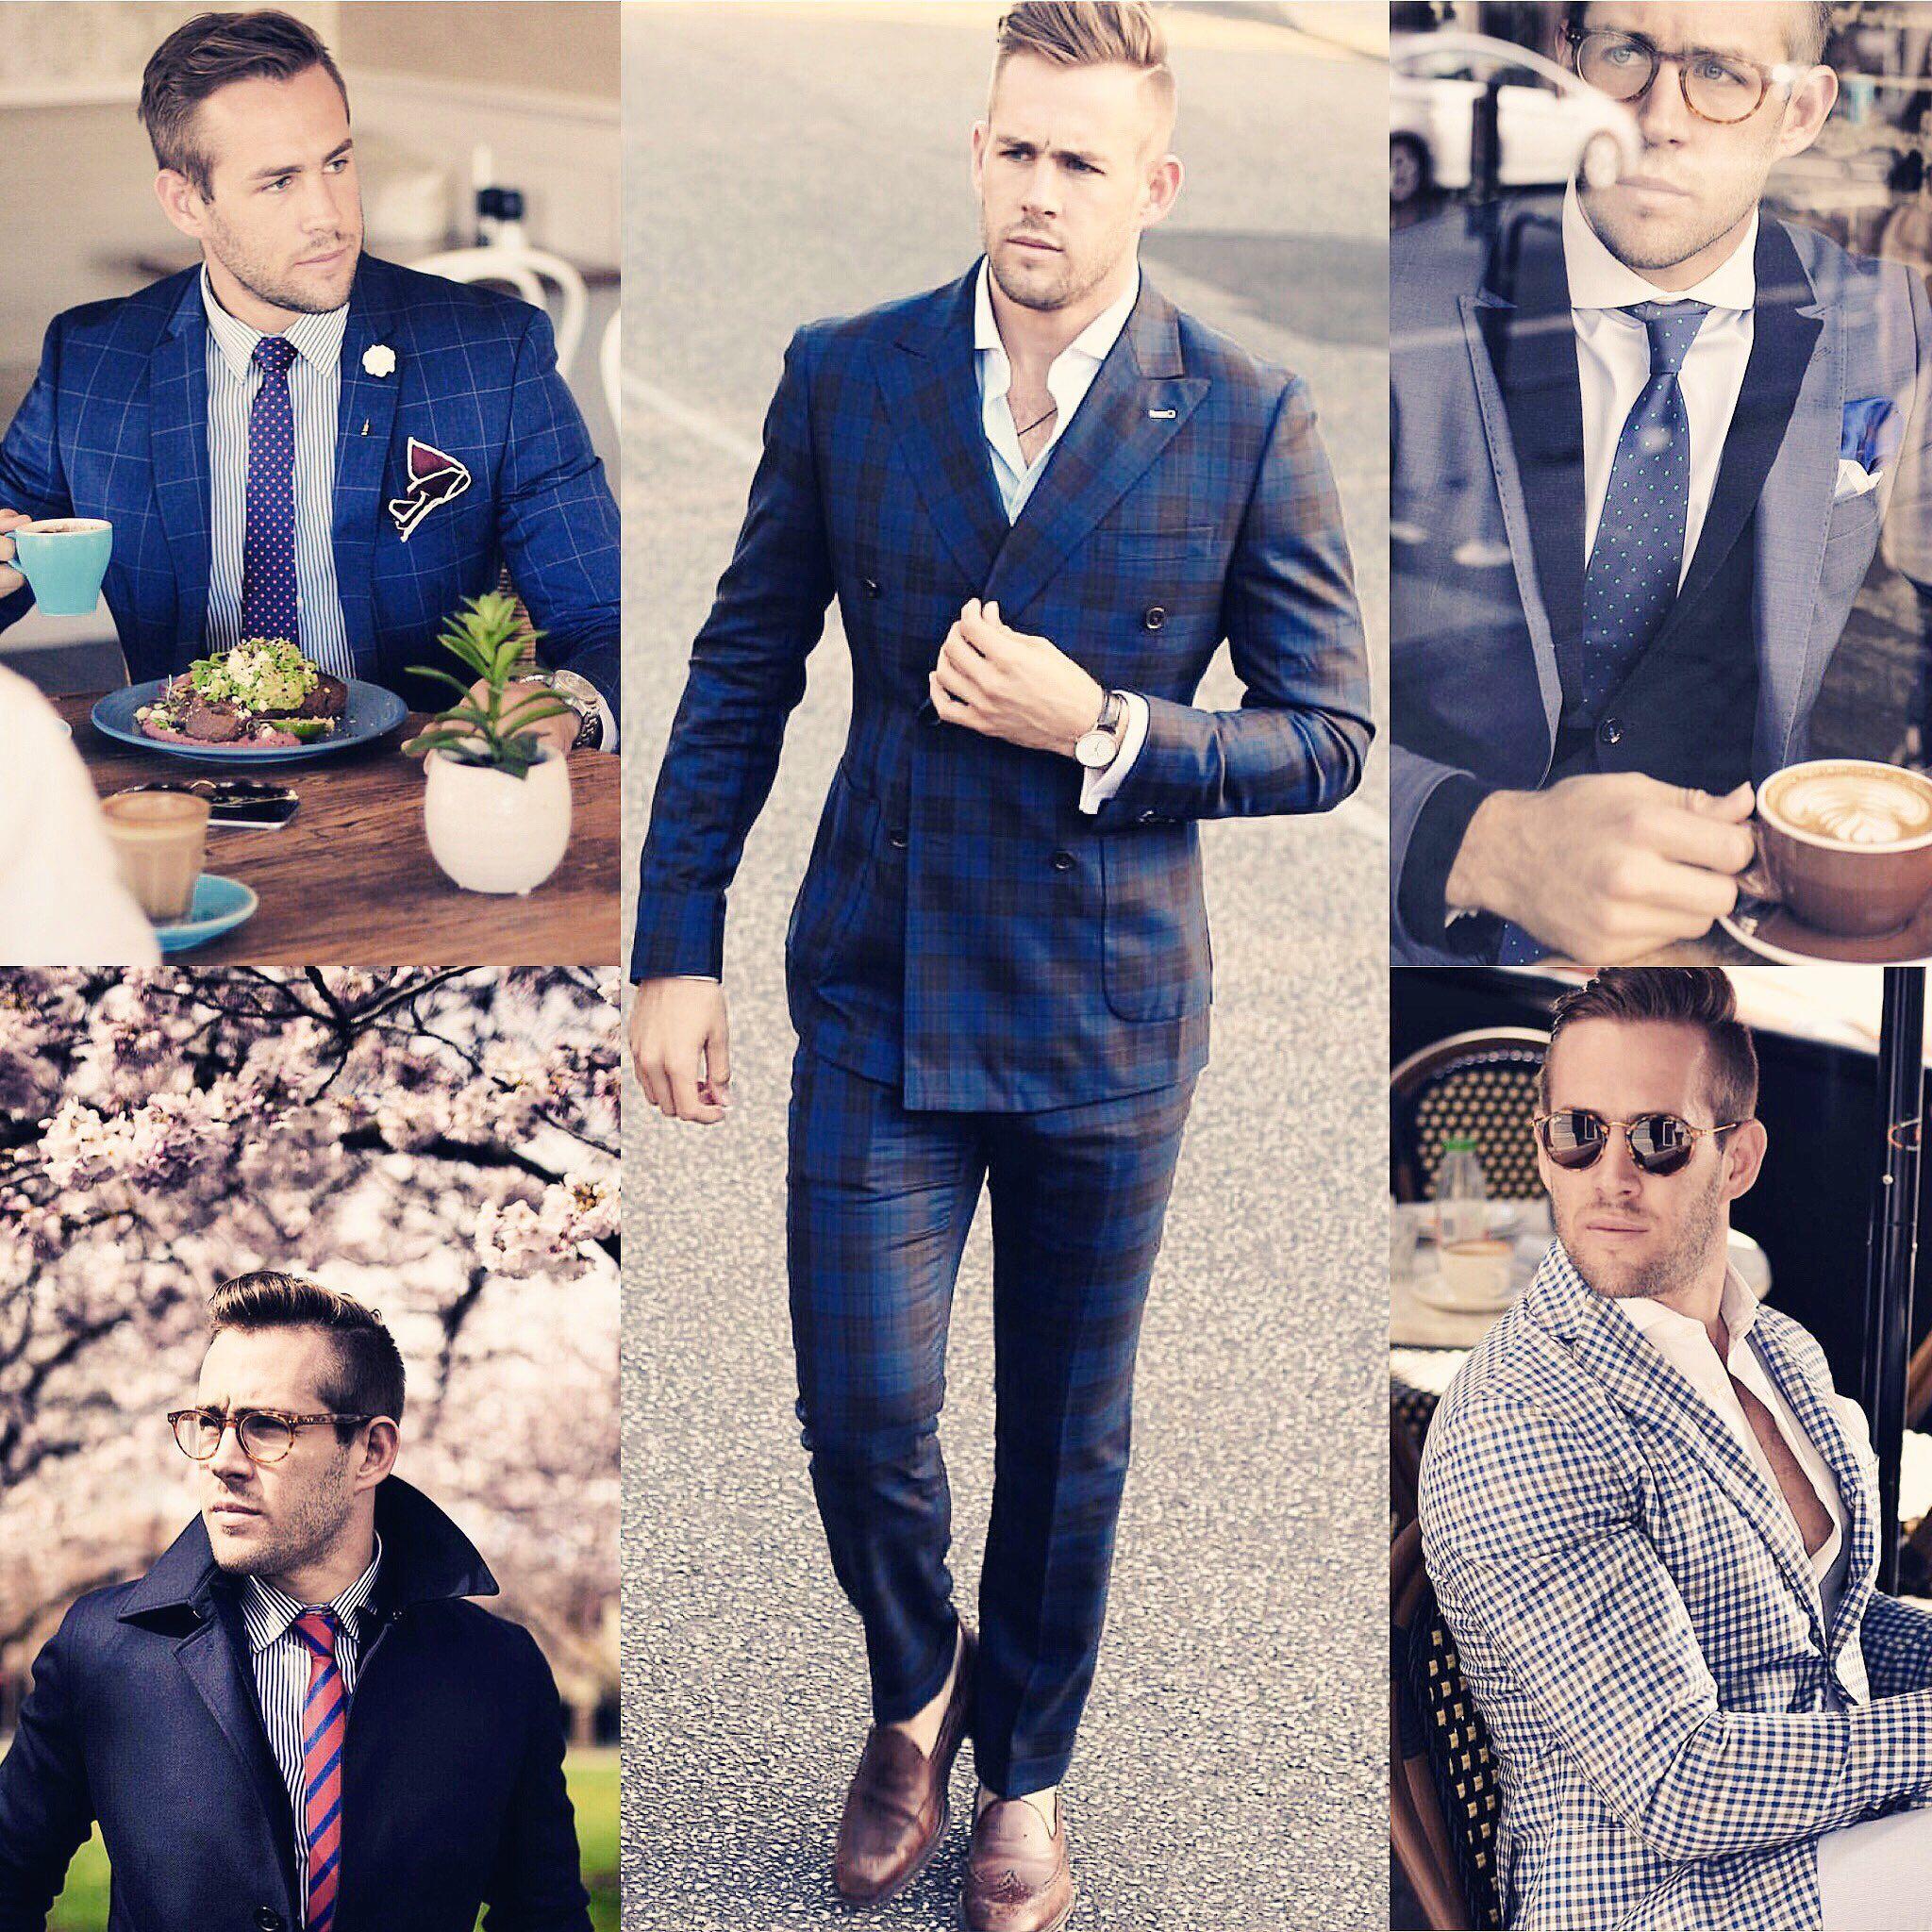 Shaun Birley, the gentleman of style inspiration #mensfashion #style #suitup #gentleman . Courtesy @shaunbirley